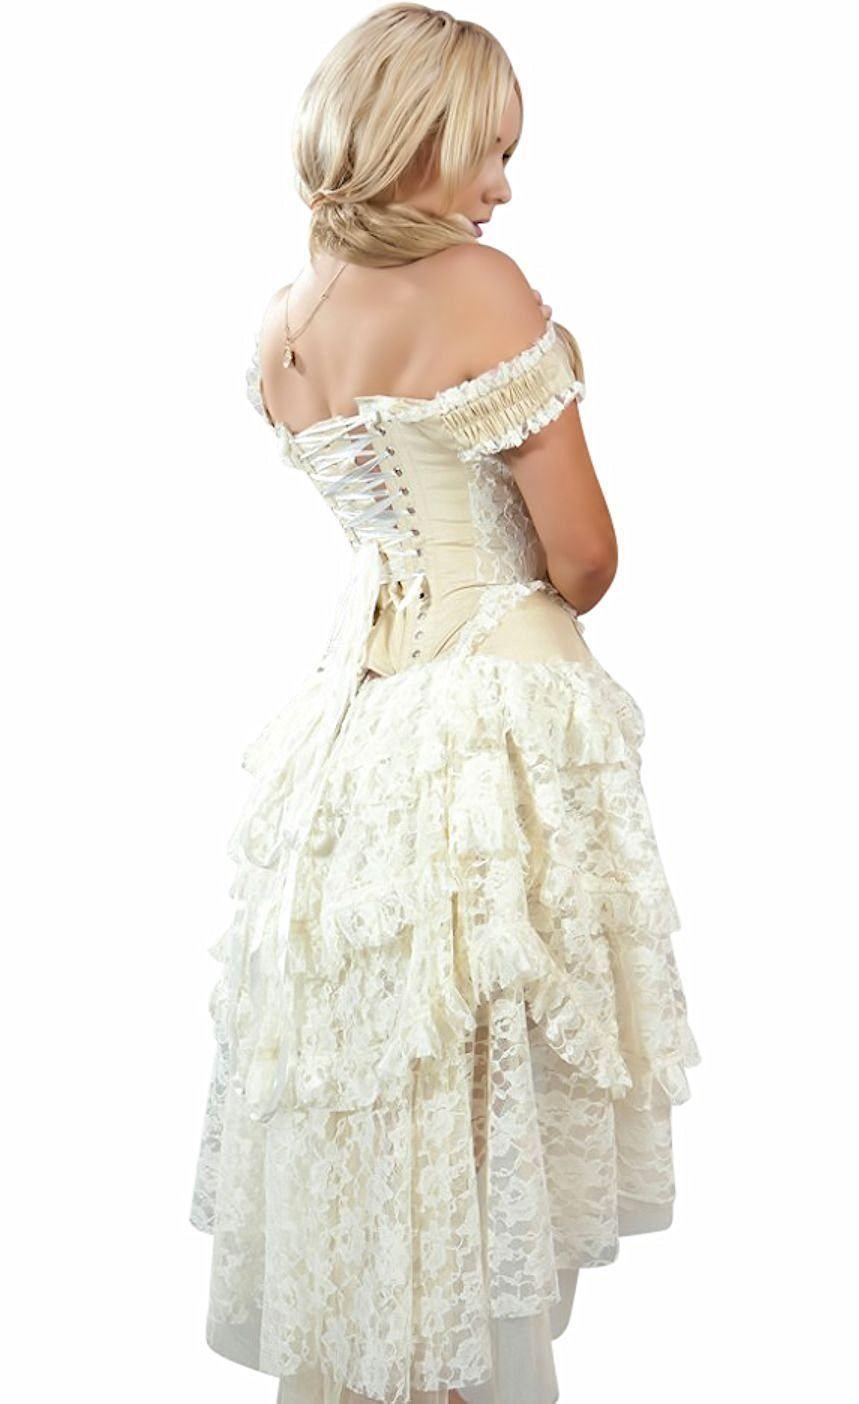 Ophelie Corset Dress Cosplay Steampunk Victorian Bridal by Burleska ...